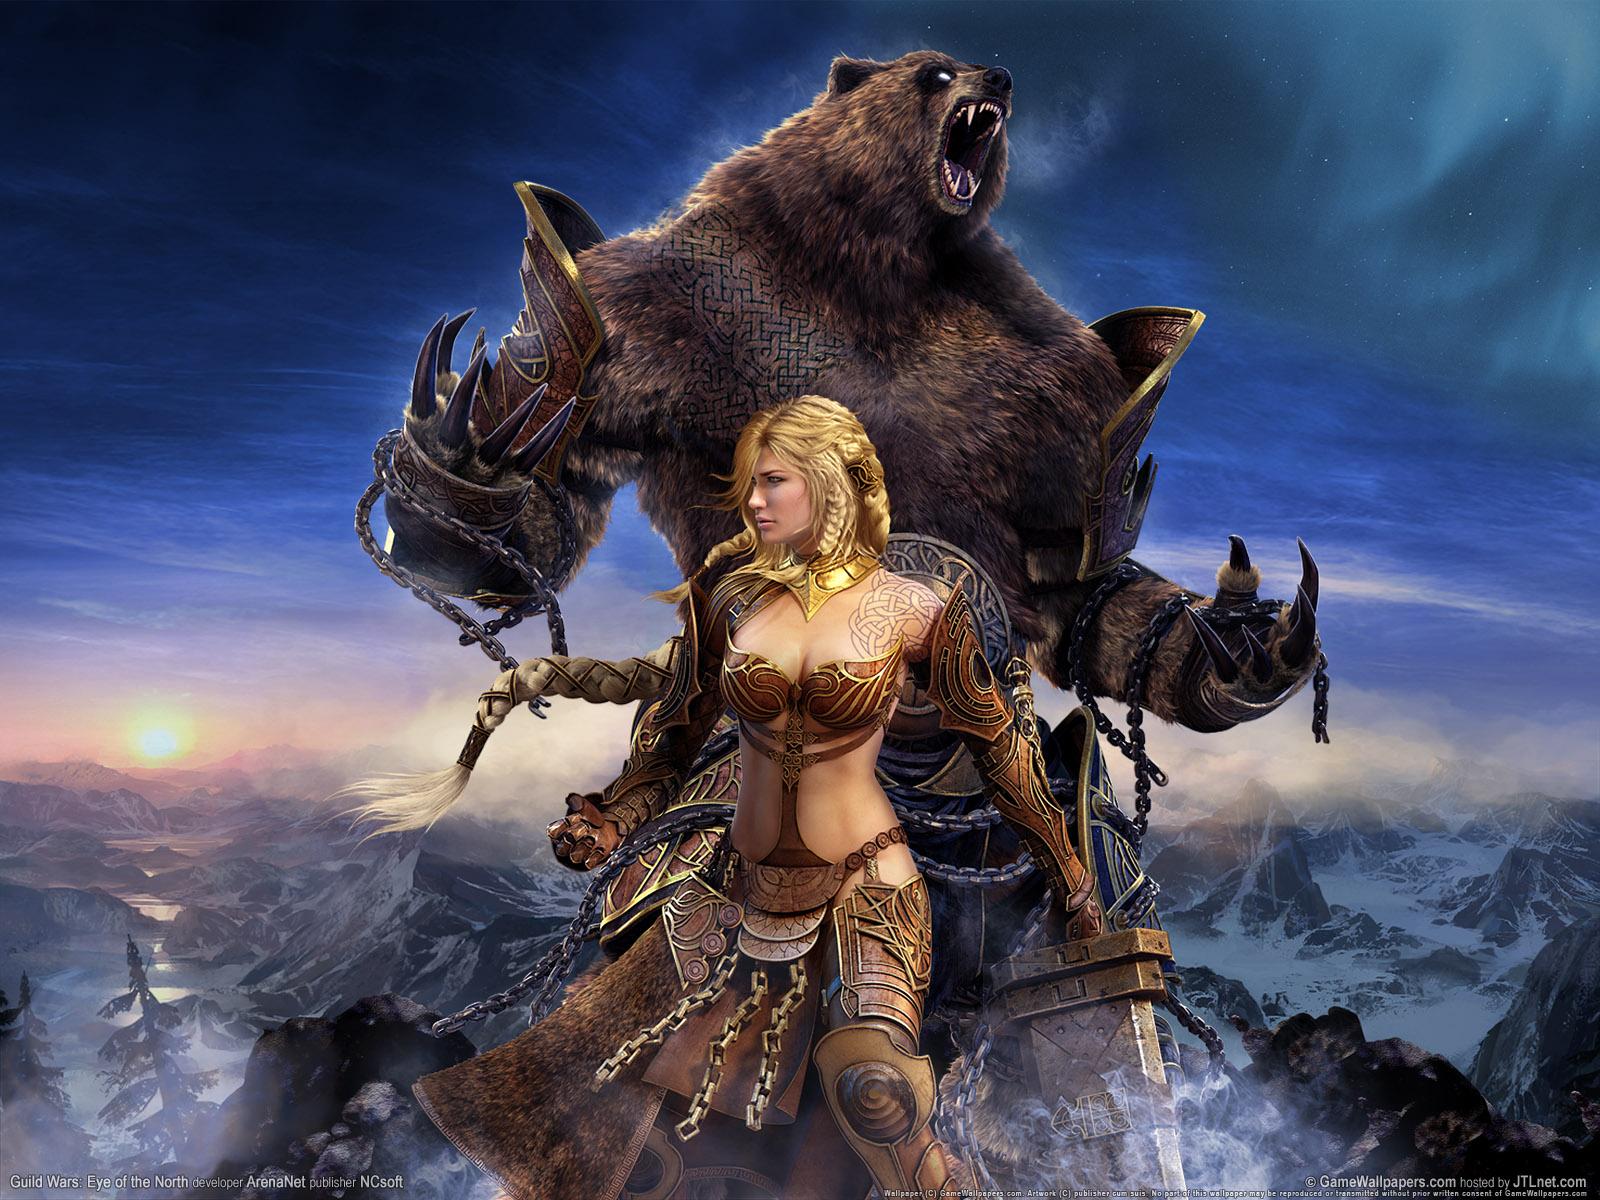 Havards Blackmoor Blog Last Fantasy Campaign Coming To An